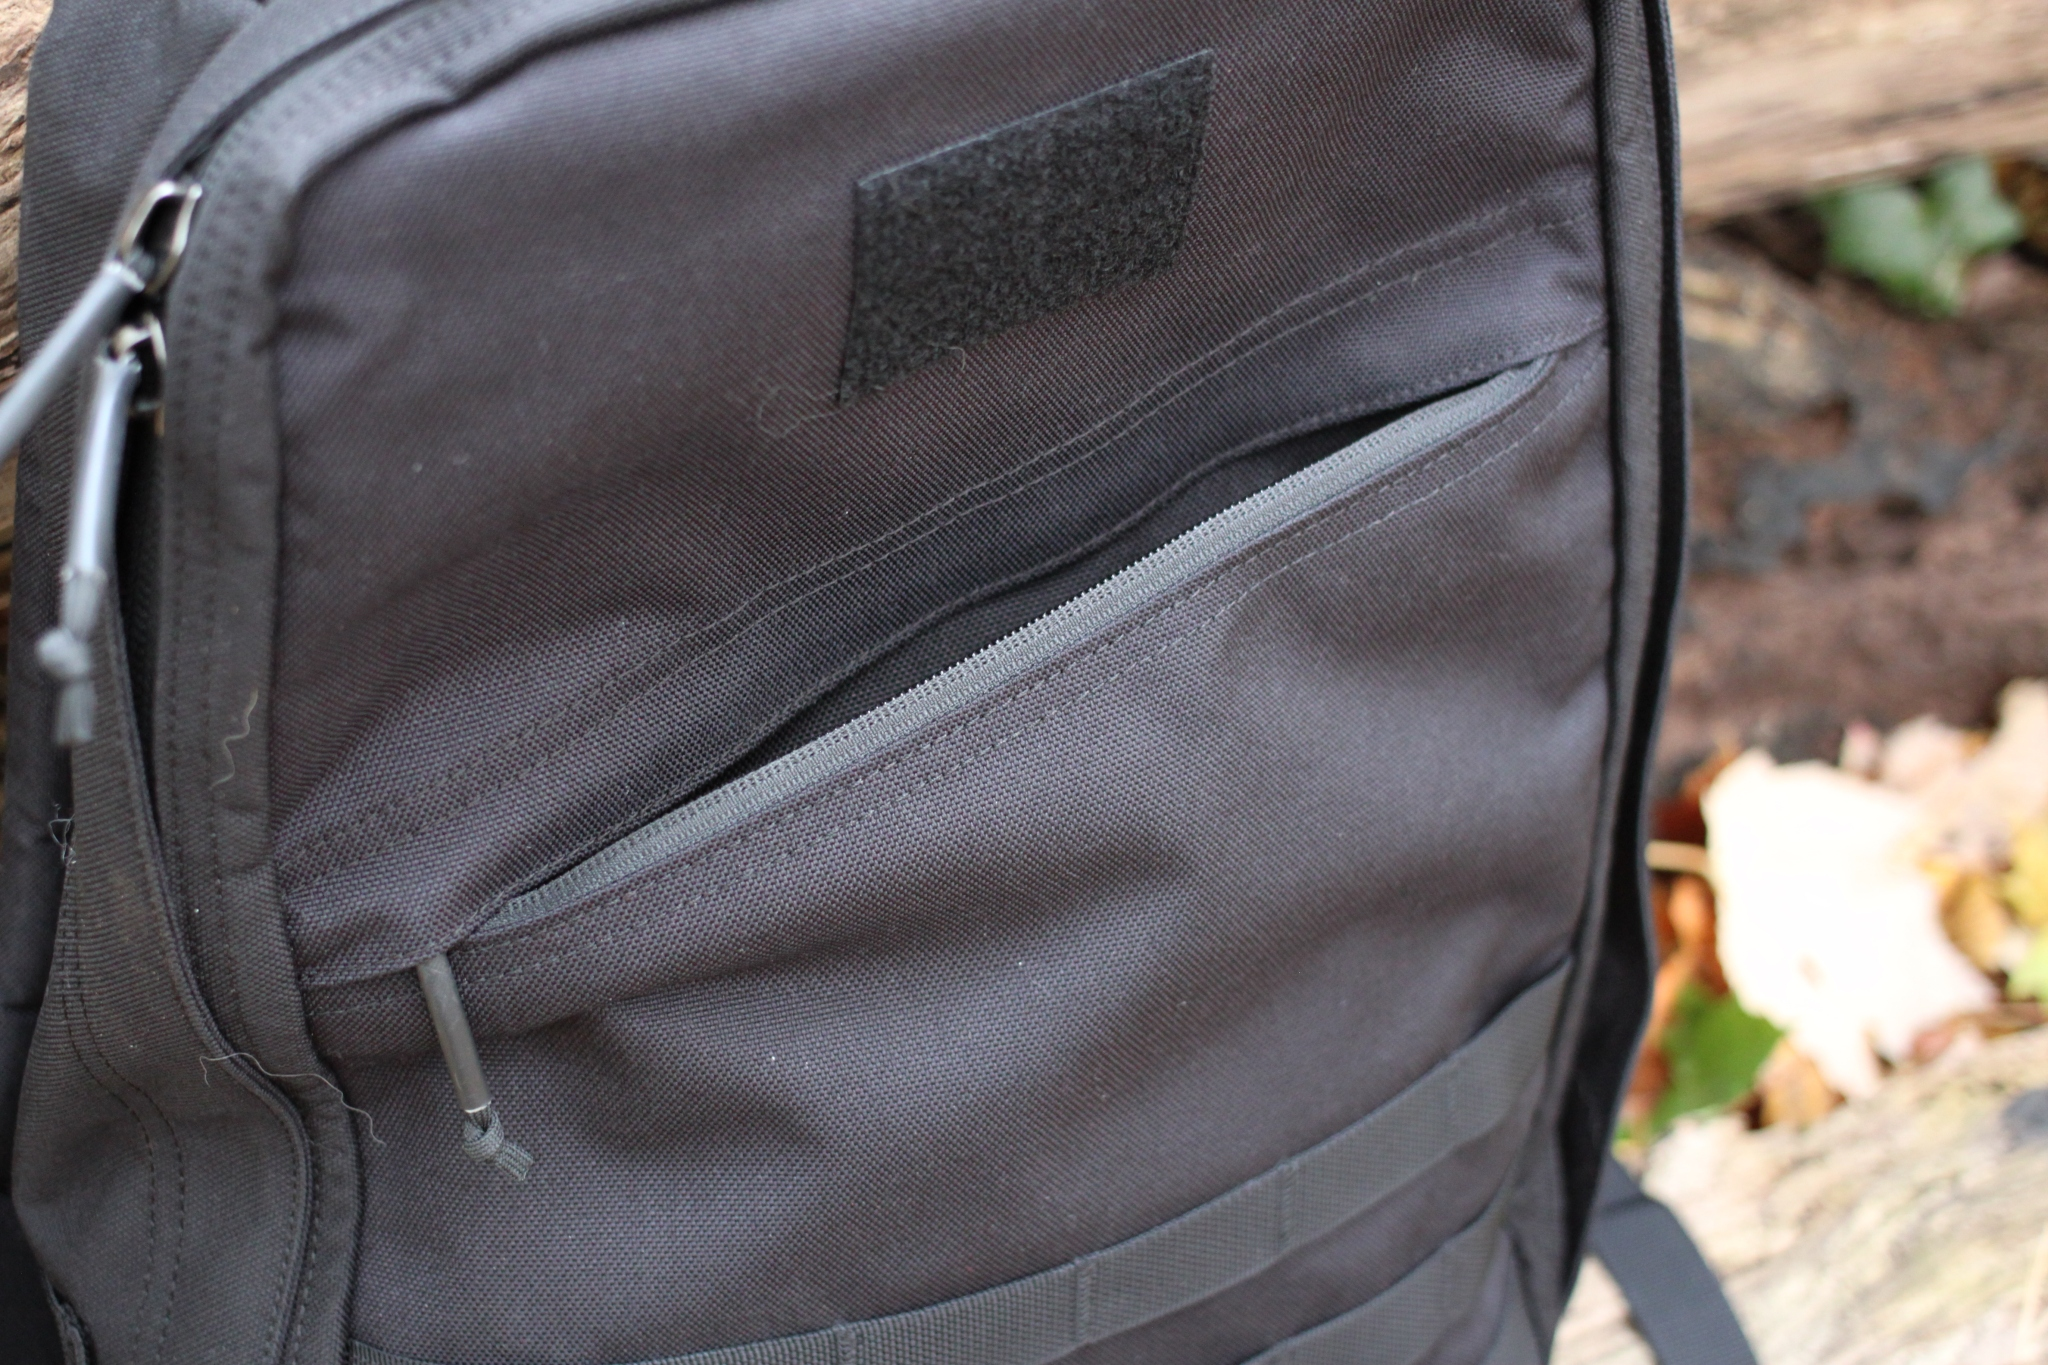 goruck gr1 review front slash pocket pals molle zippers